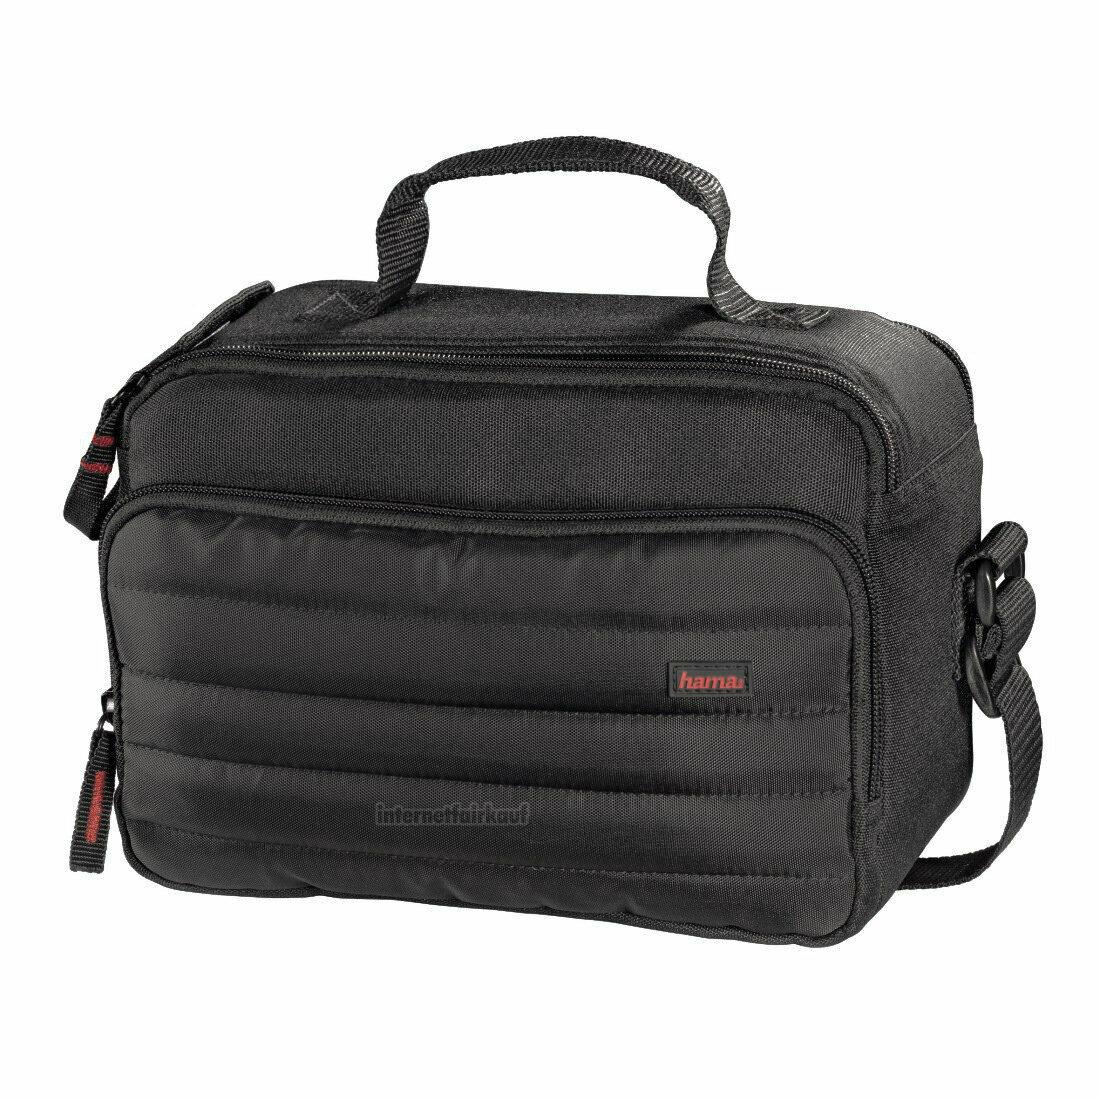 Fototasche Kameratasche passend für Nikon D5300 D5200 D5100